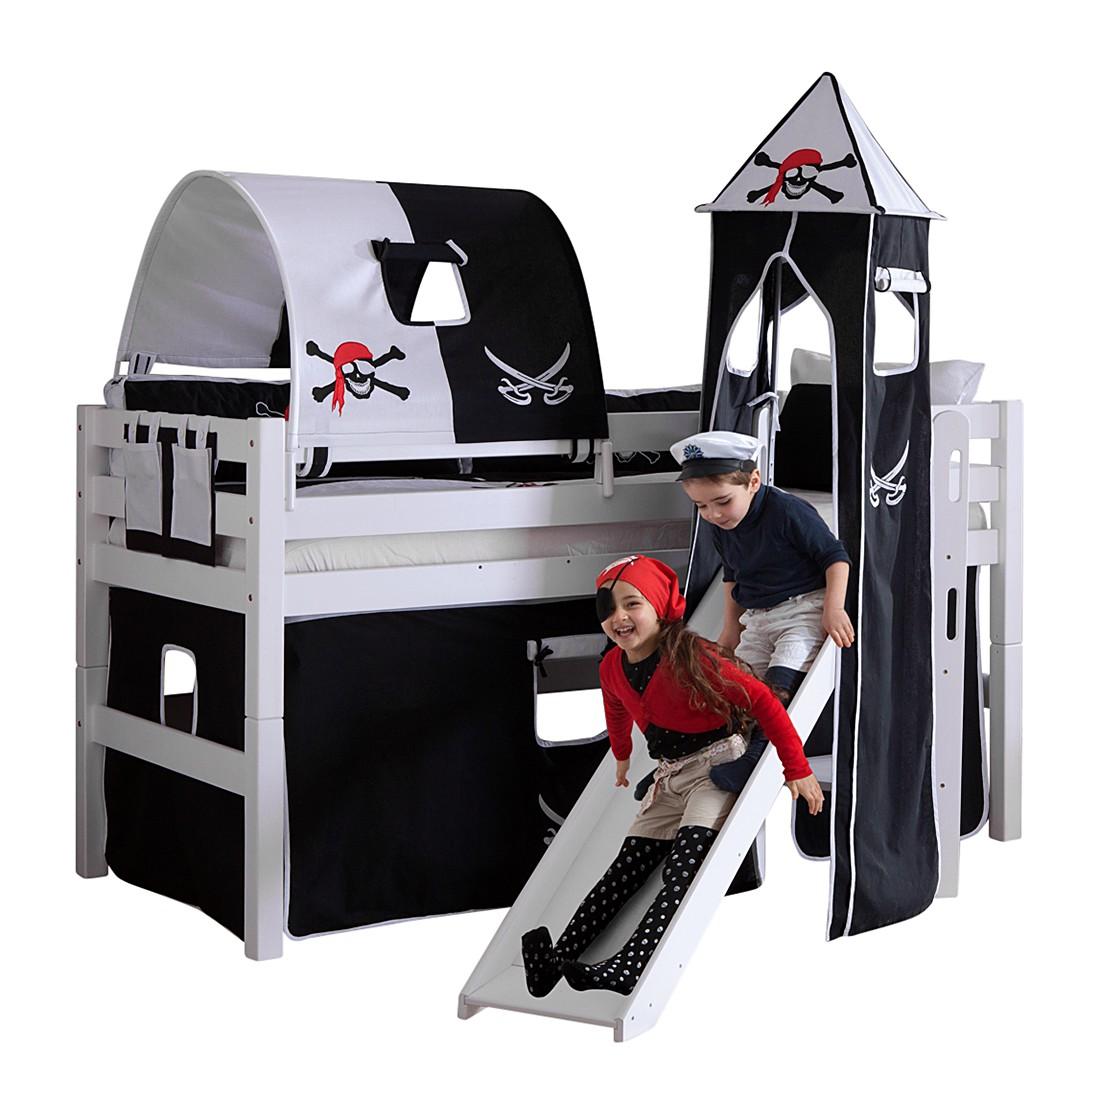 tunnel pirat g nstig kaufen. Black Bedroom Furniture Sets. Home Design Ideas